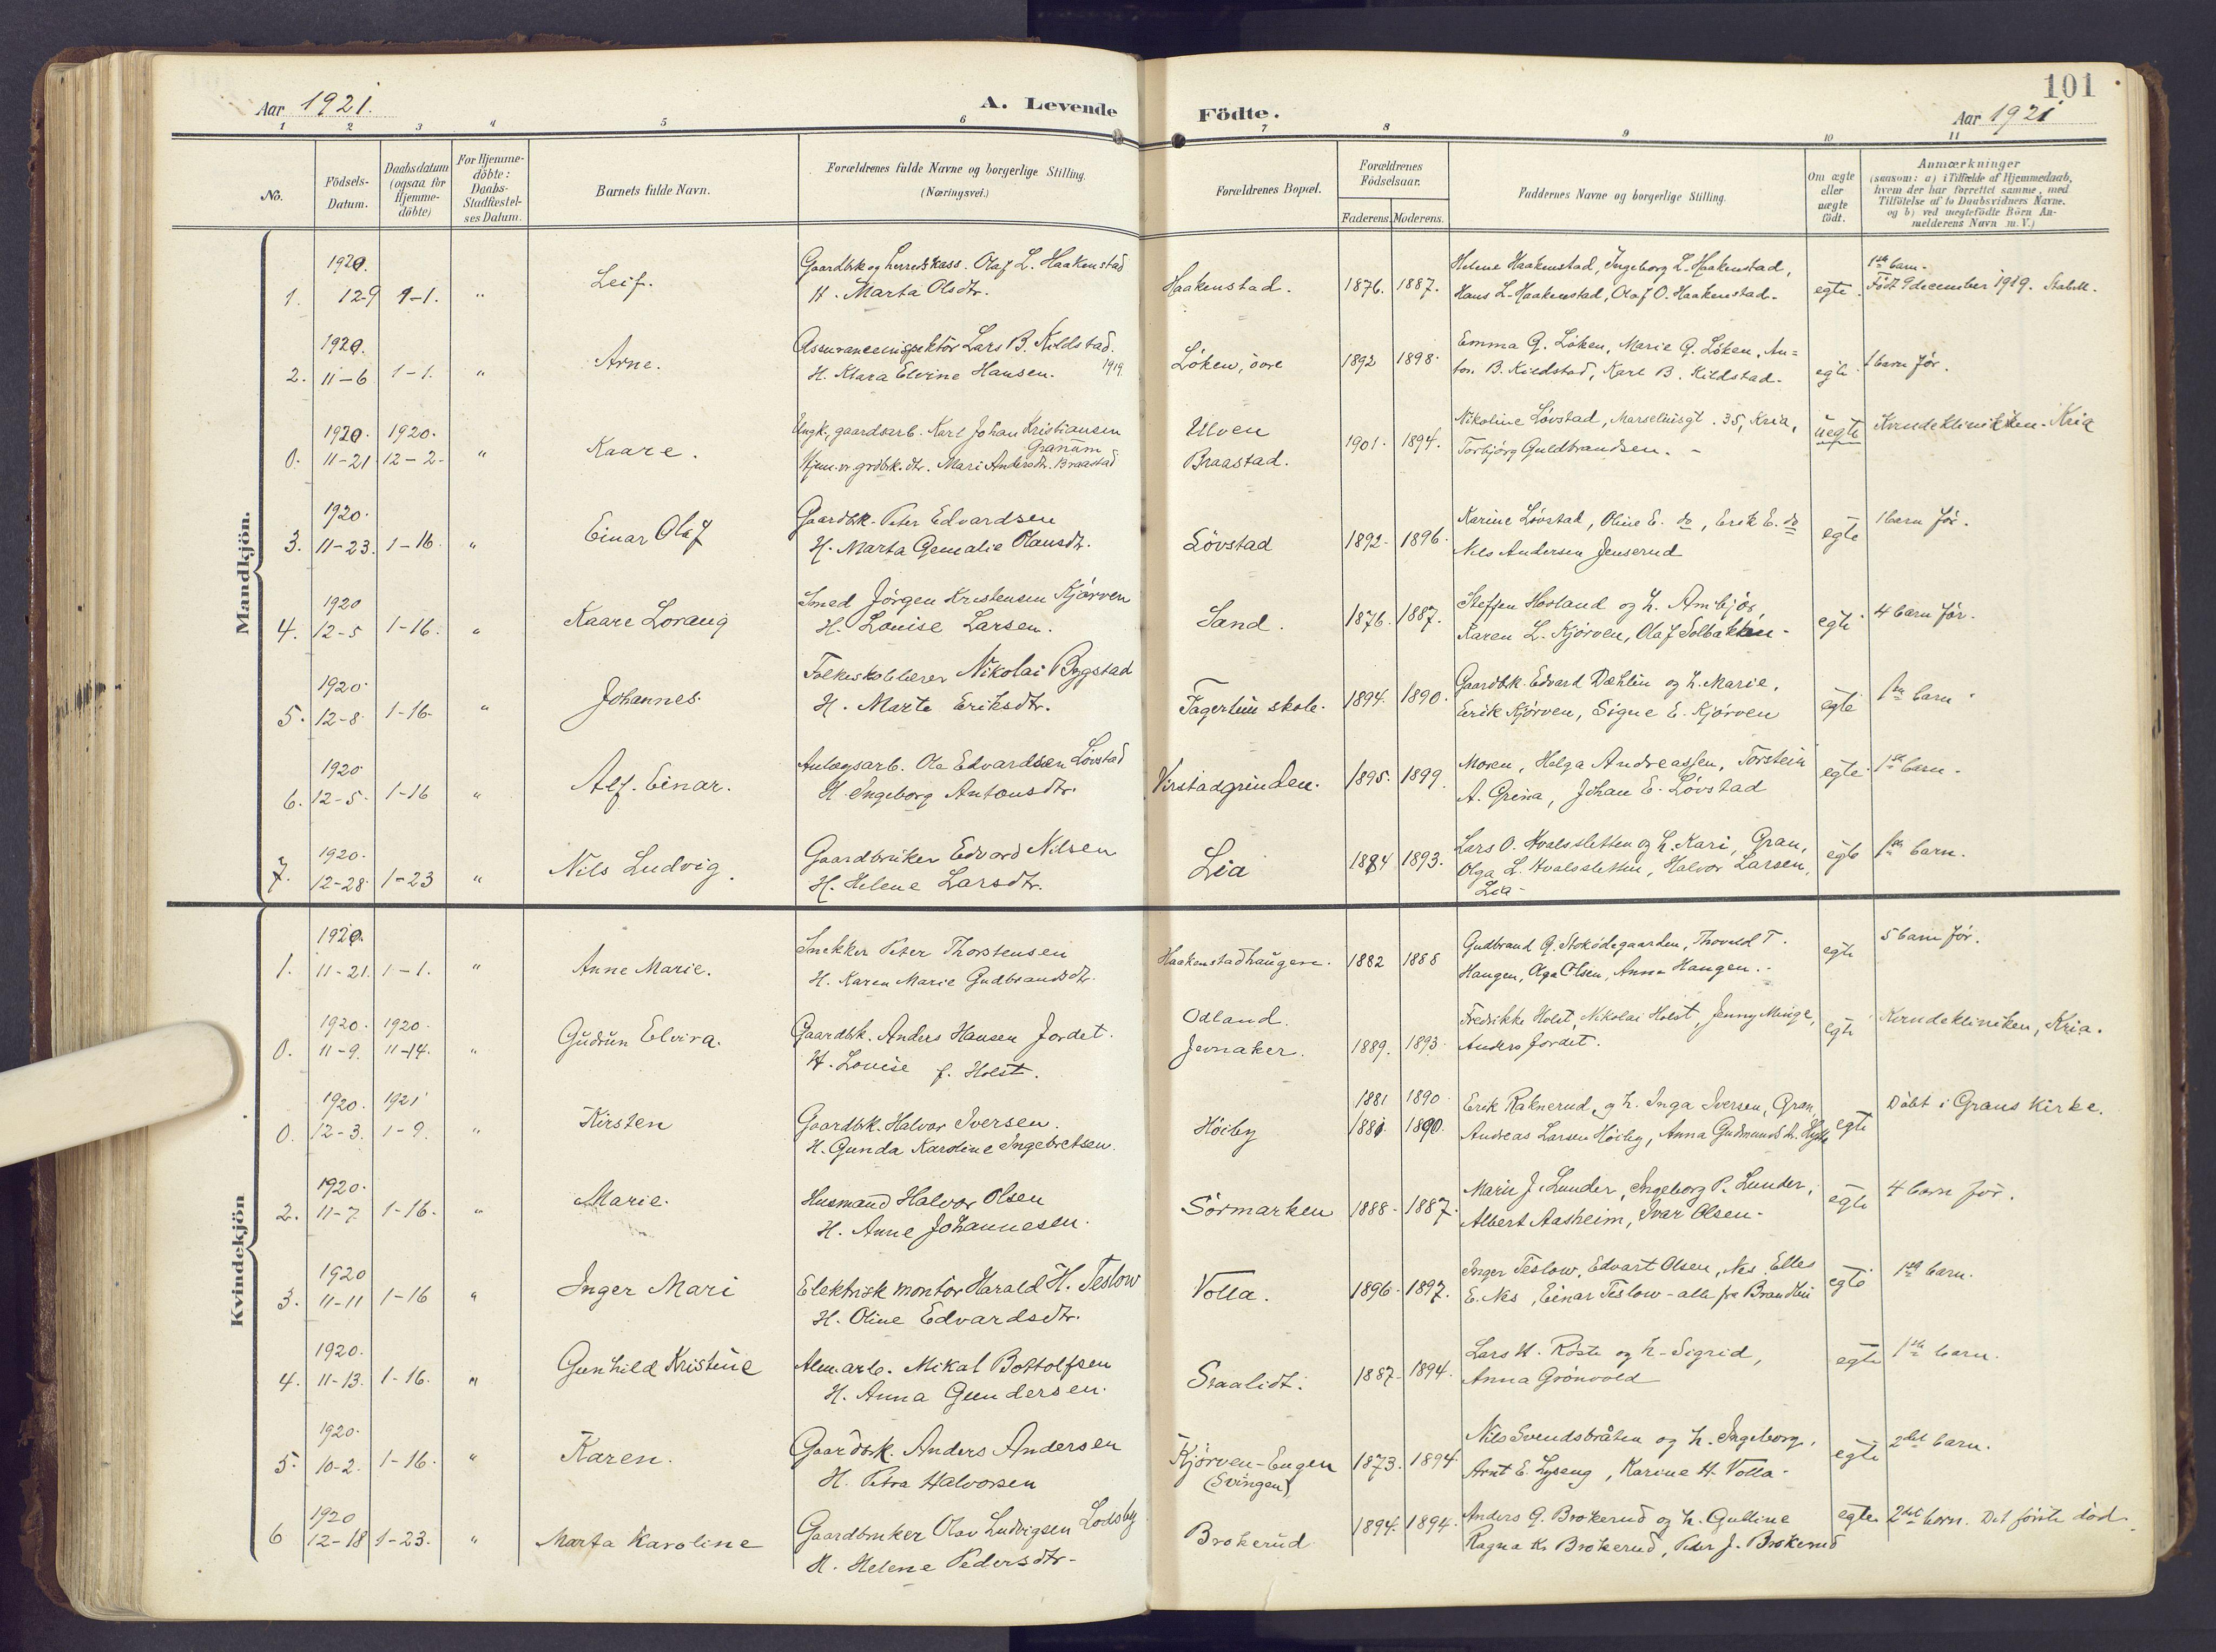 SAH, Lunner prestekontor, H/Ha/Haa/L0001: Ministerialbok nr. 1, 1907-1922, s. 101